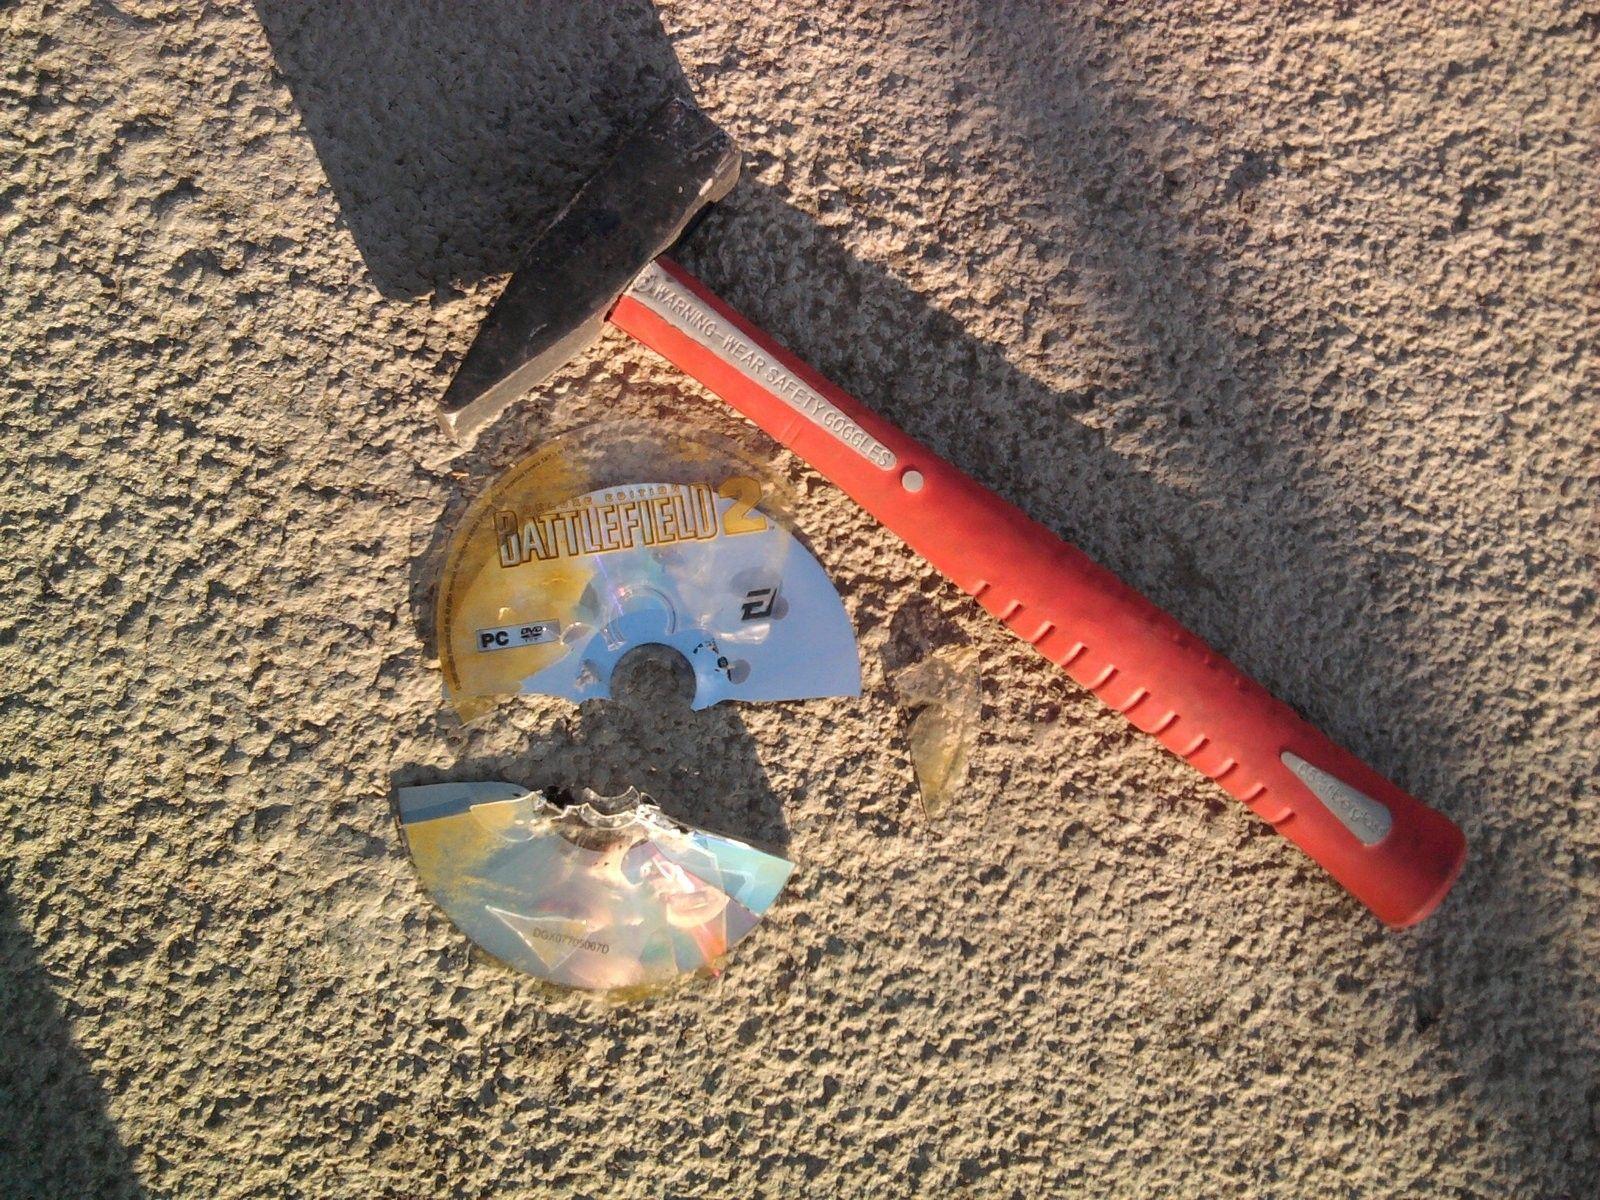 Uh Oh - battlefield_2_disc_broken_hammered_by_gokituuz-d60r1ub.jpg